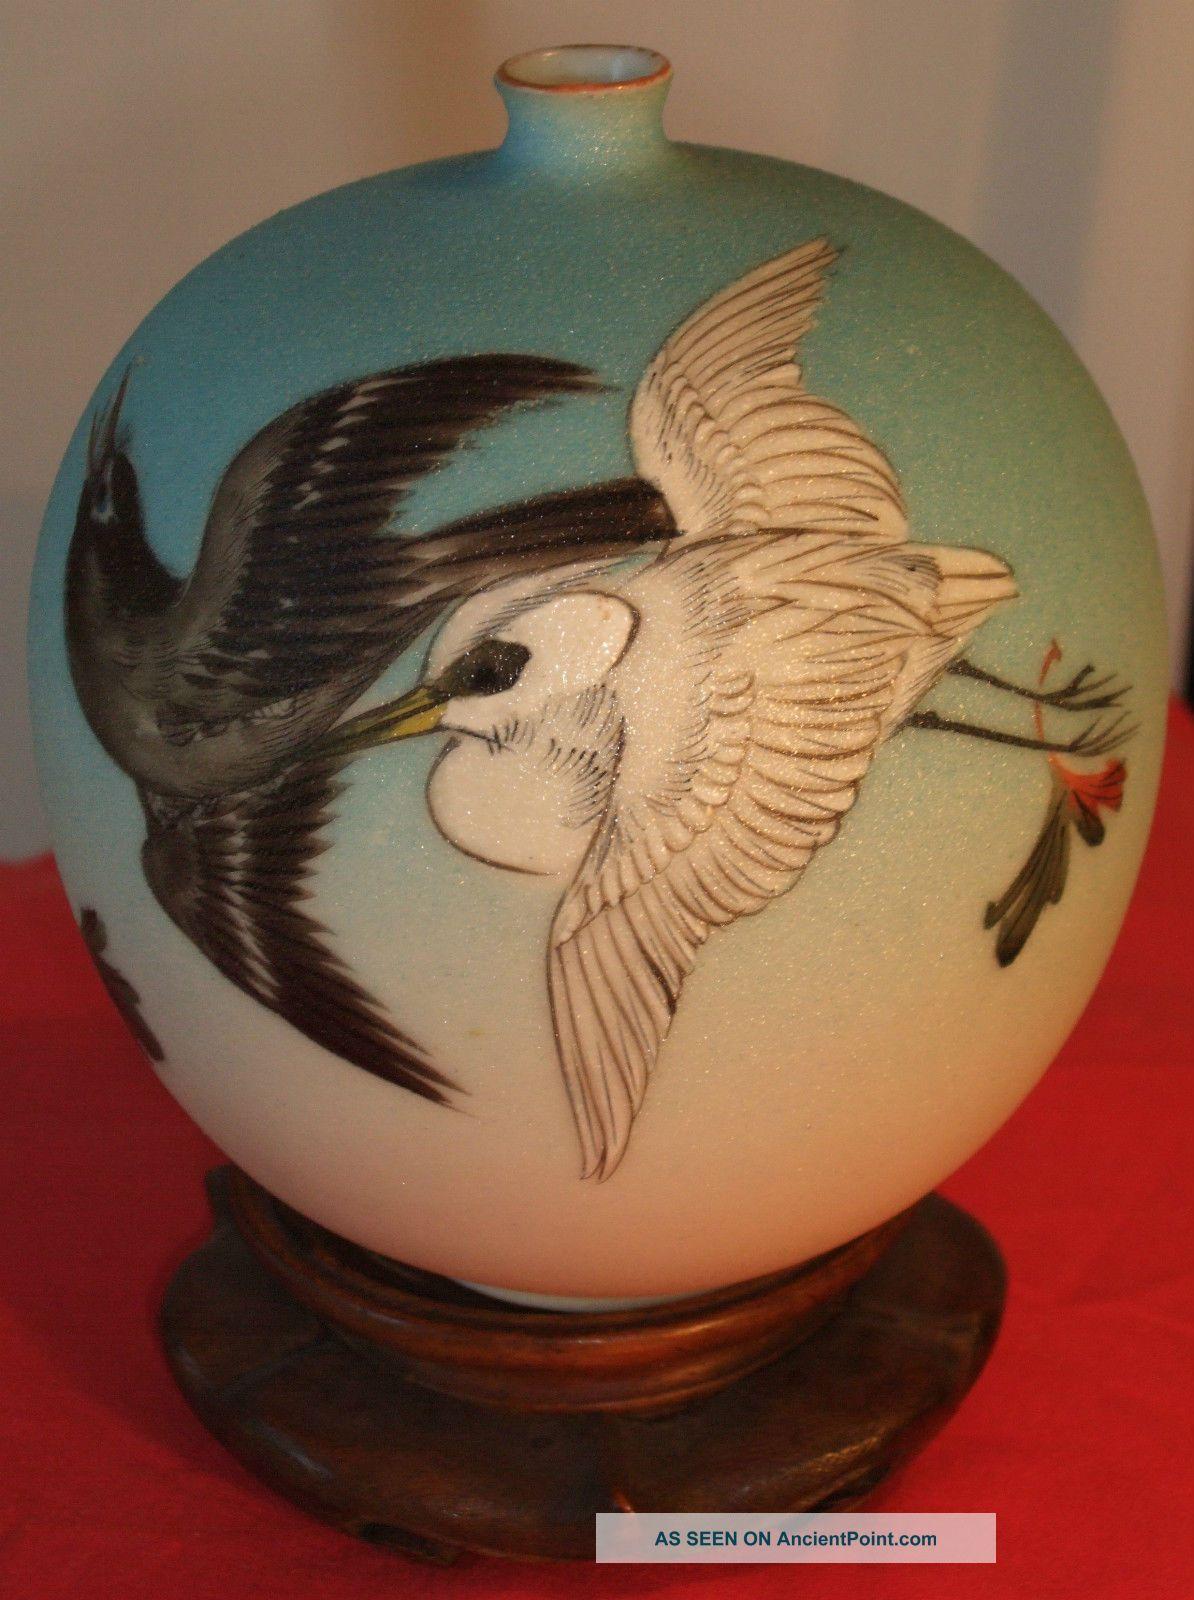 Magnificent Antique Takeuchi Chubei Signed Sharkskin Textured Porcelain Vase. Uncategorized photo